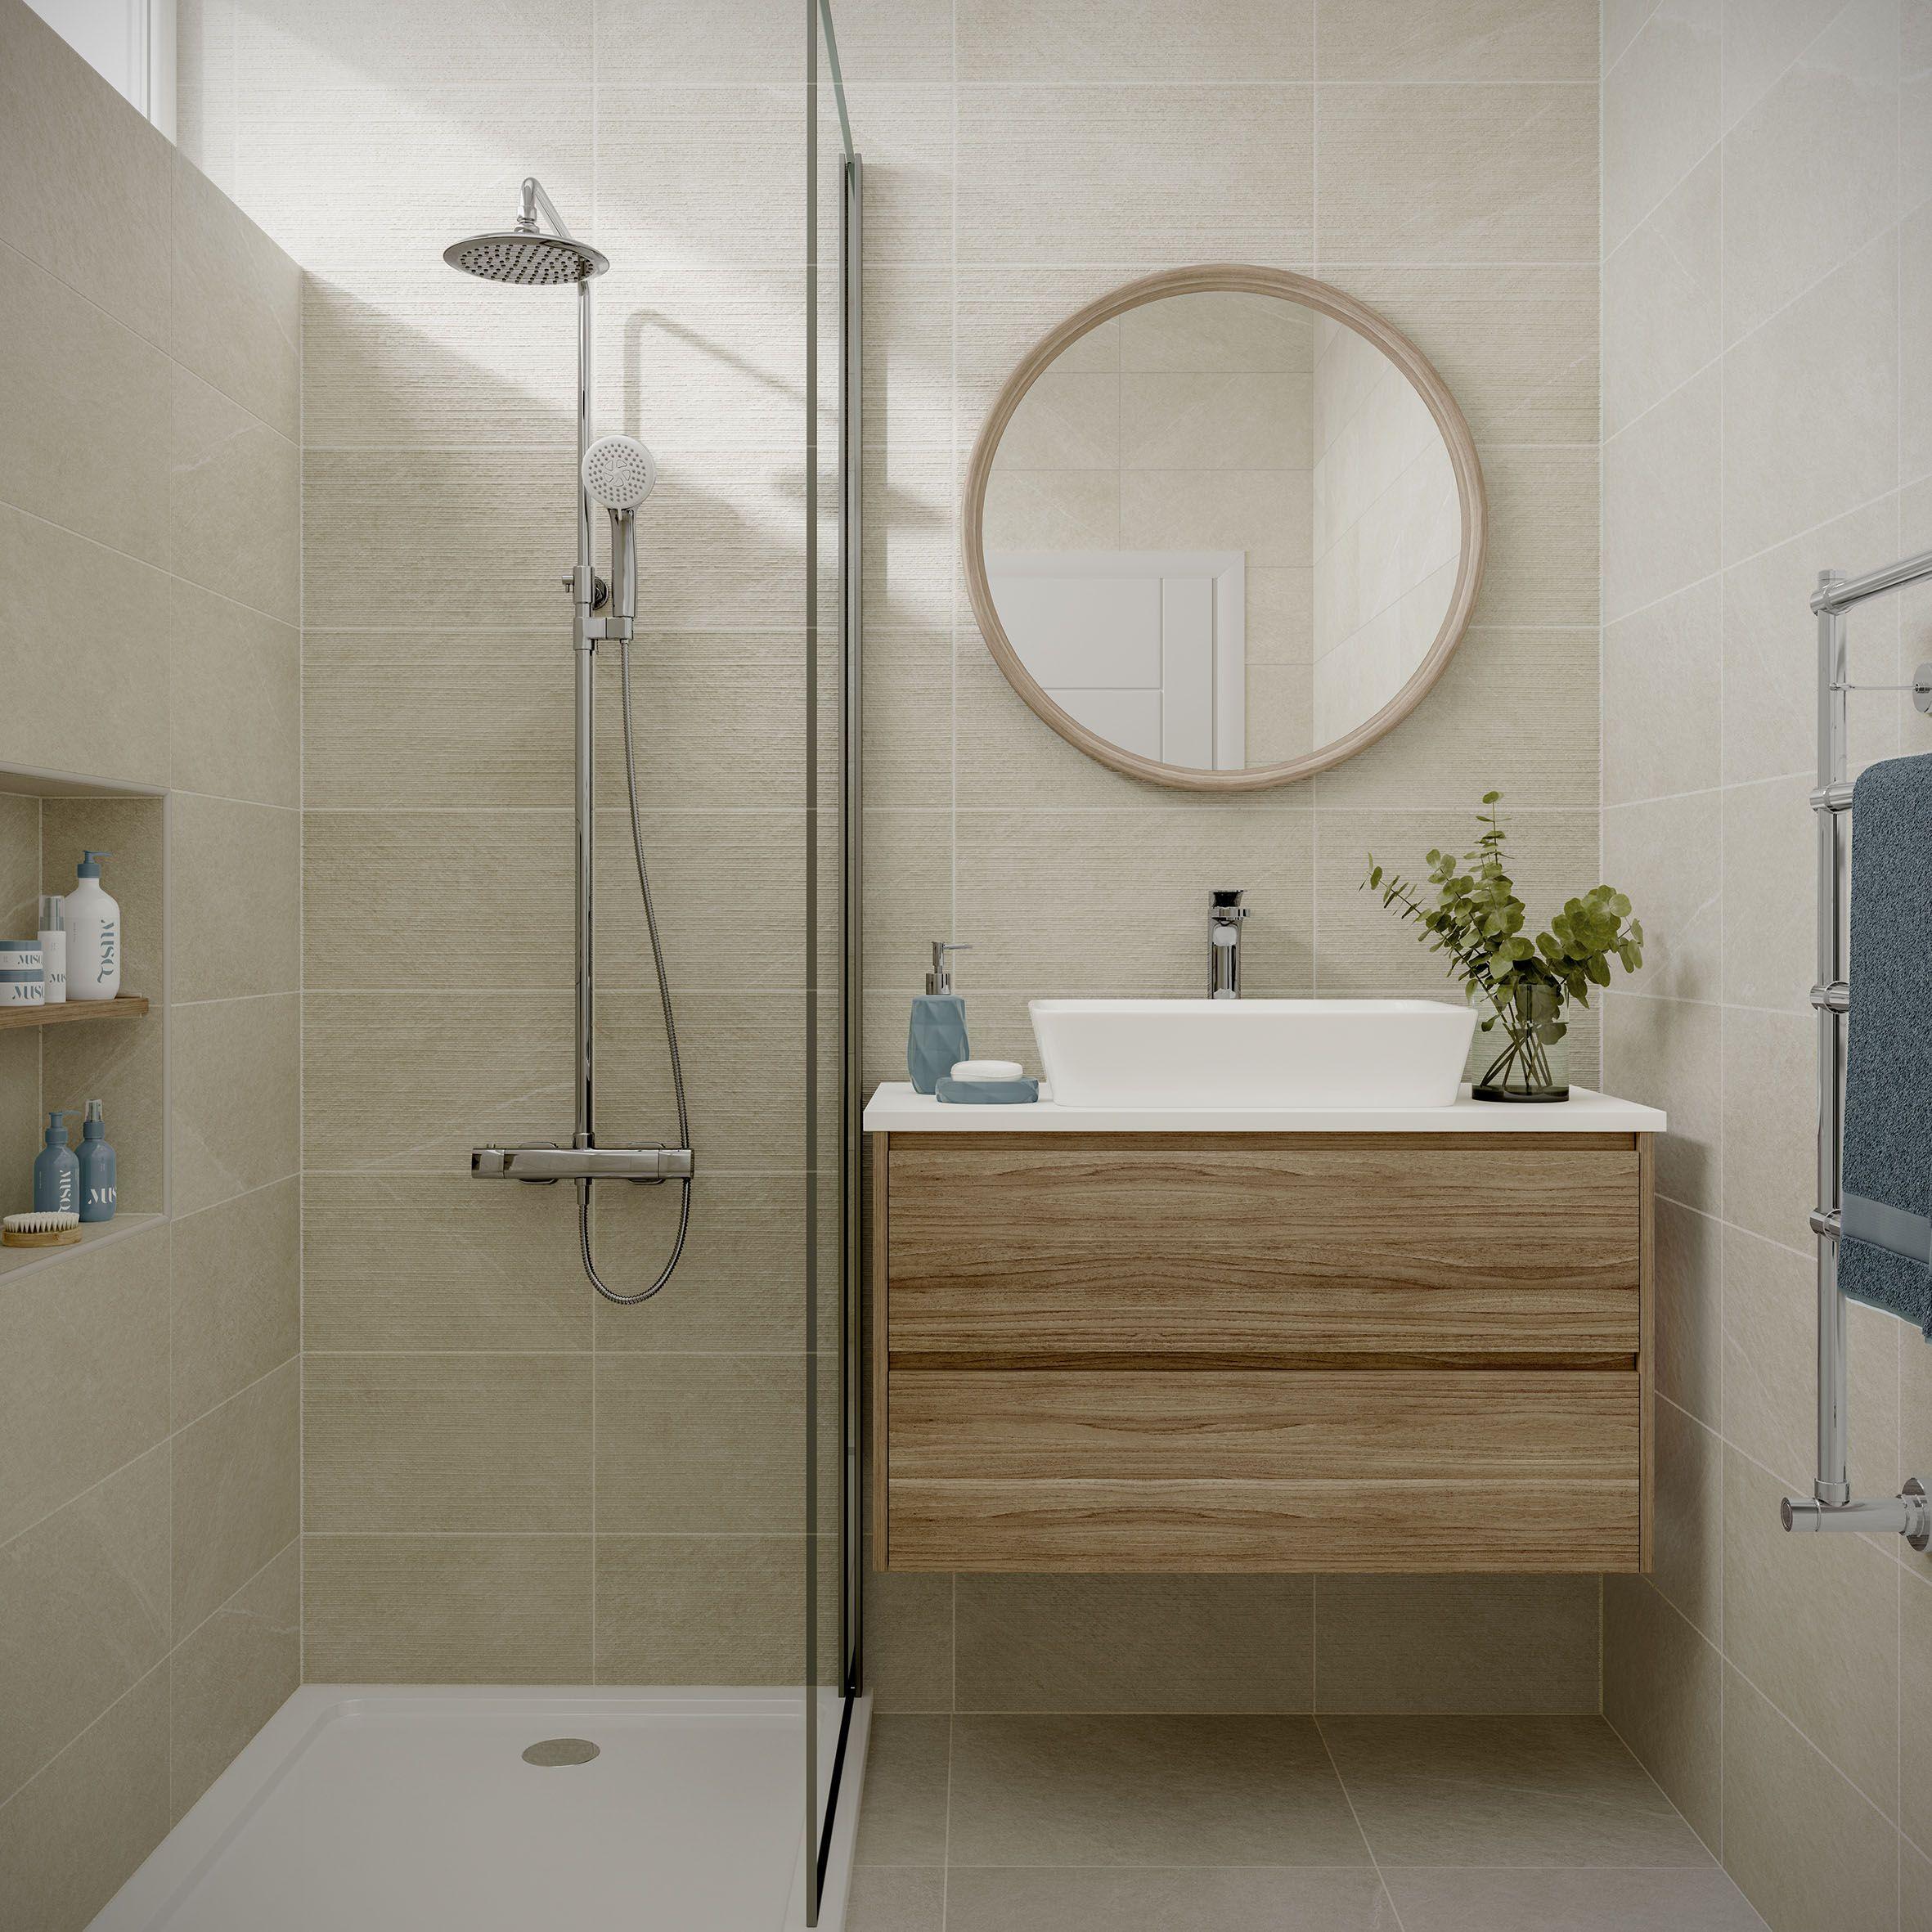 Ingleton Cream Bathroom Wall Tile Stone Tile Bathroom Tile Bathroom